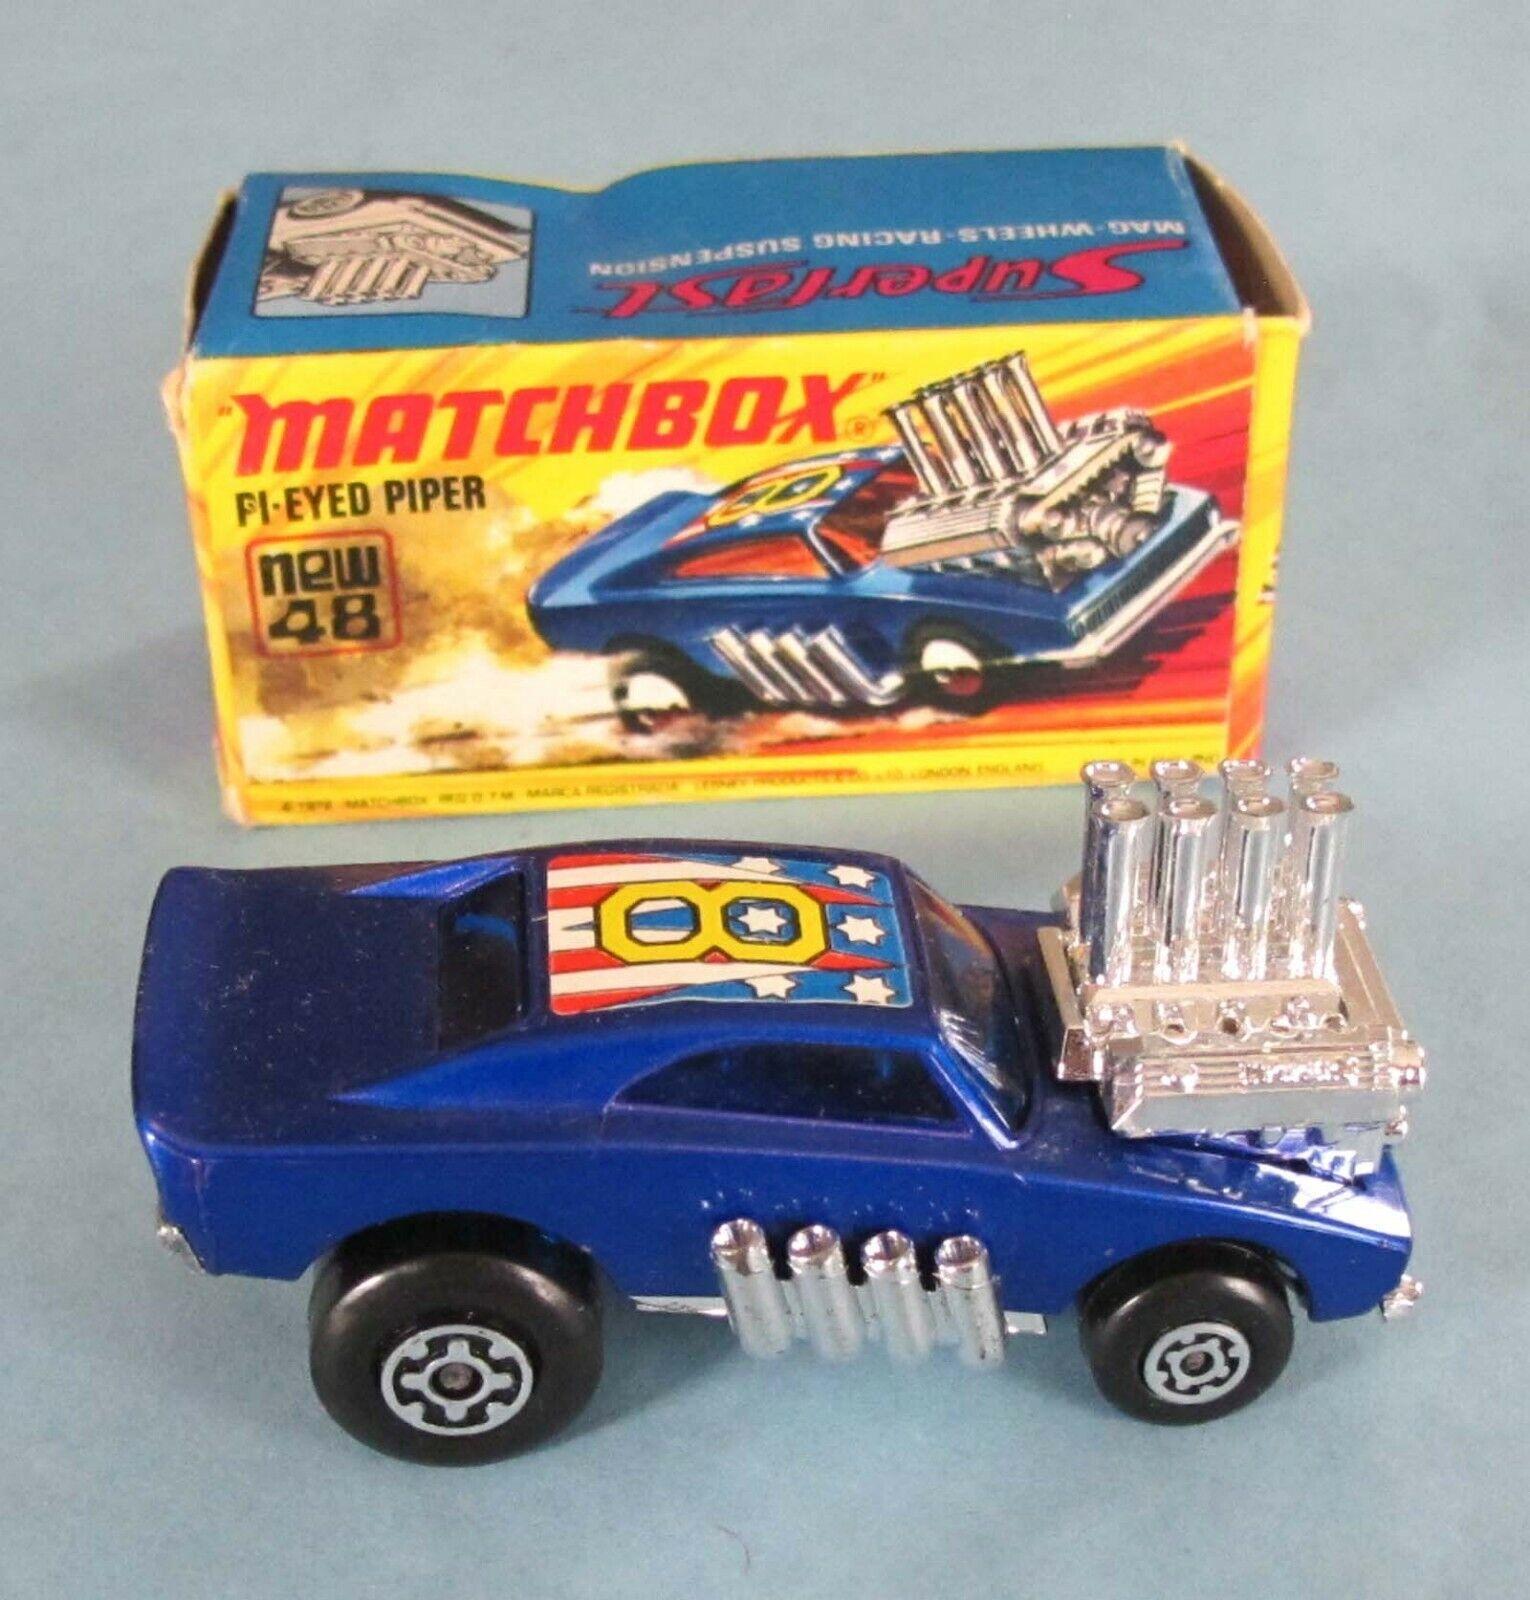 Vintage-Matchbox-pi-eyed piper-Nº 48 - © 1972-LESNEY-Coffret-bleu Windows